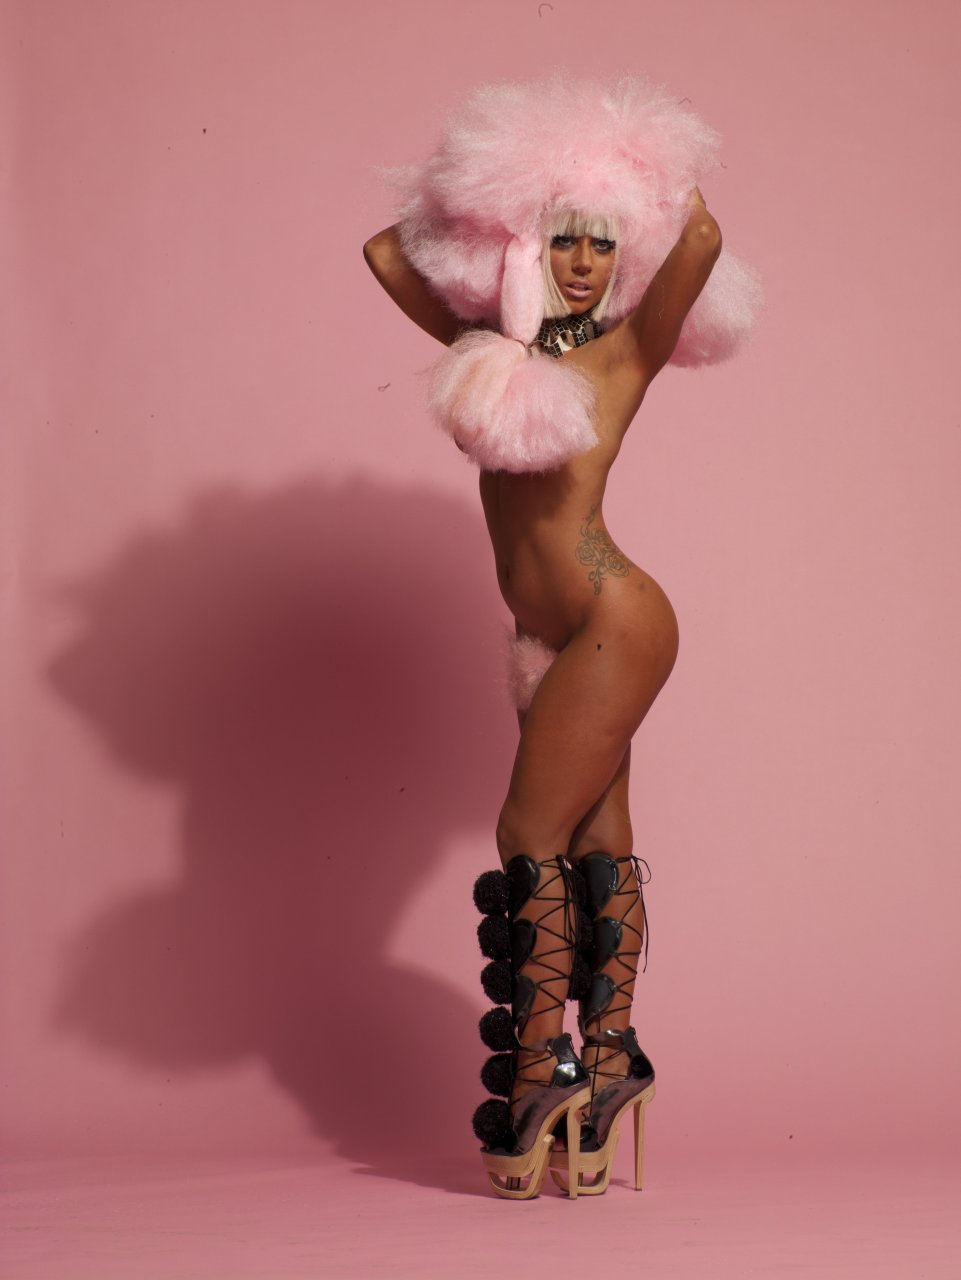 lady gaga bitch naked